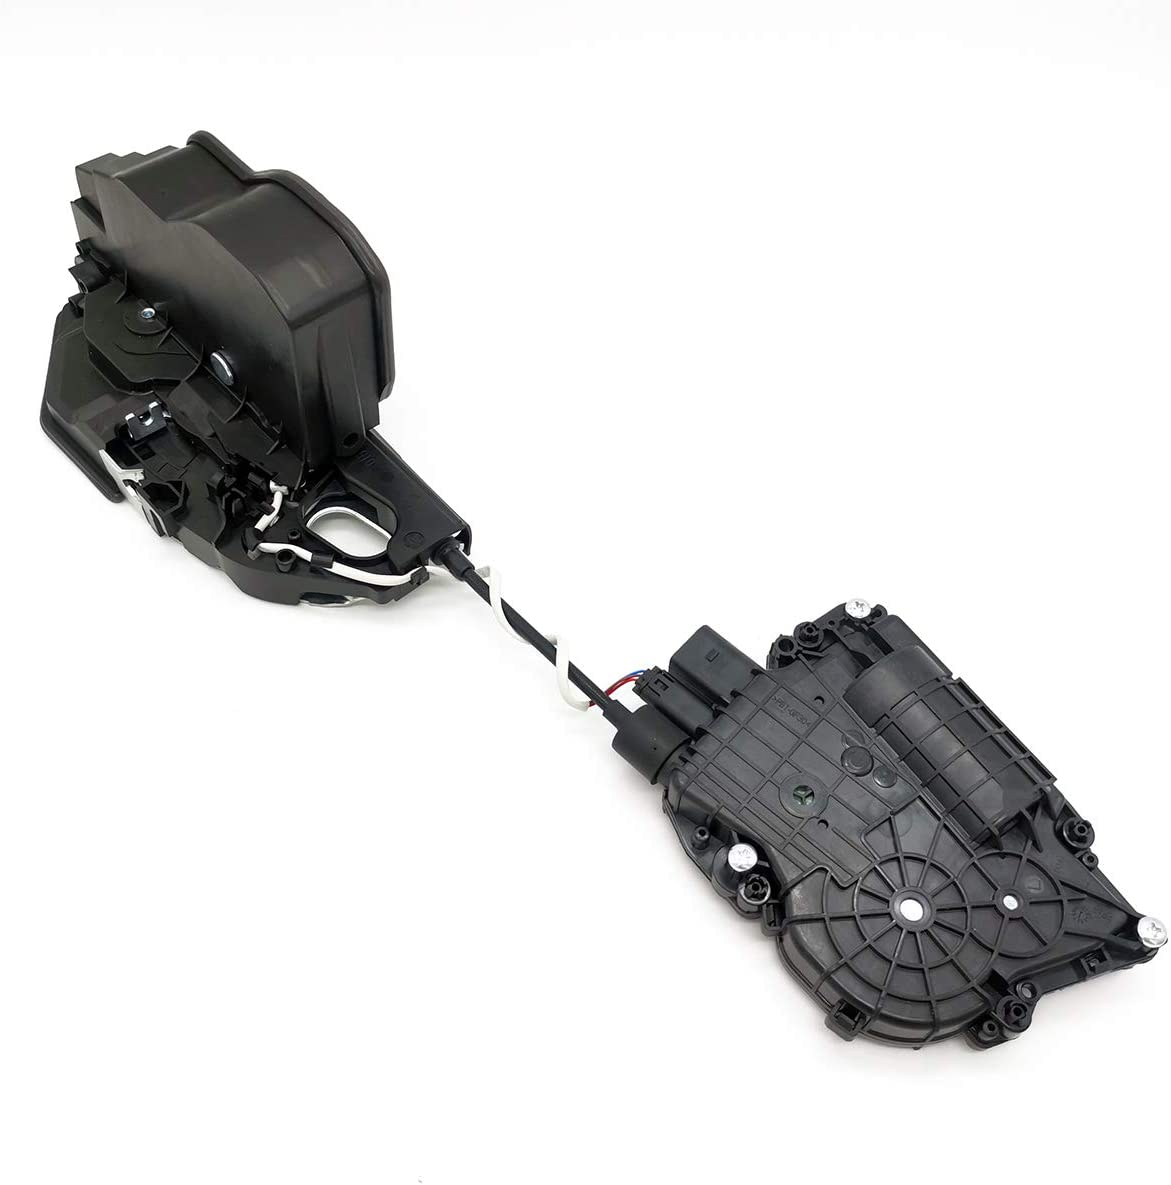 Cheriezing 51217185692 Courier shipping free Soft Close Door Mechanism Lock F Actuator [Alternative dealer]